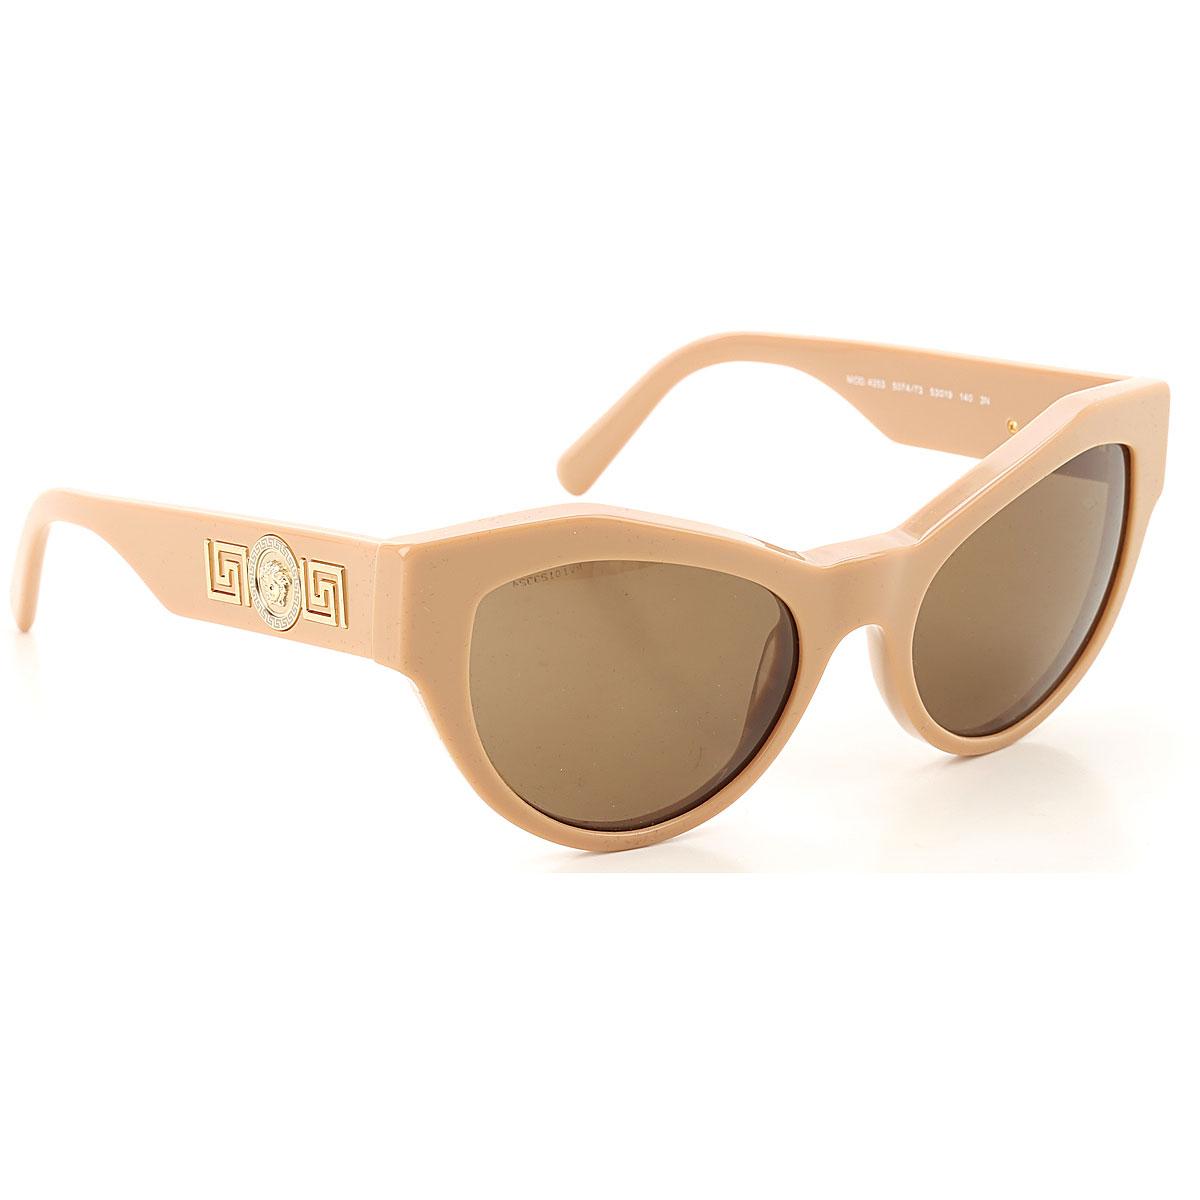 Gianni Versace Sunglasses On Sale, Beige, 2019